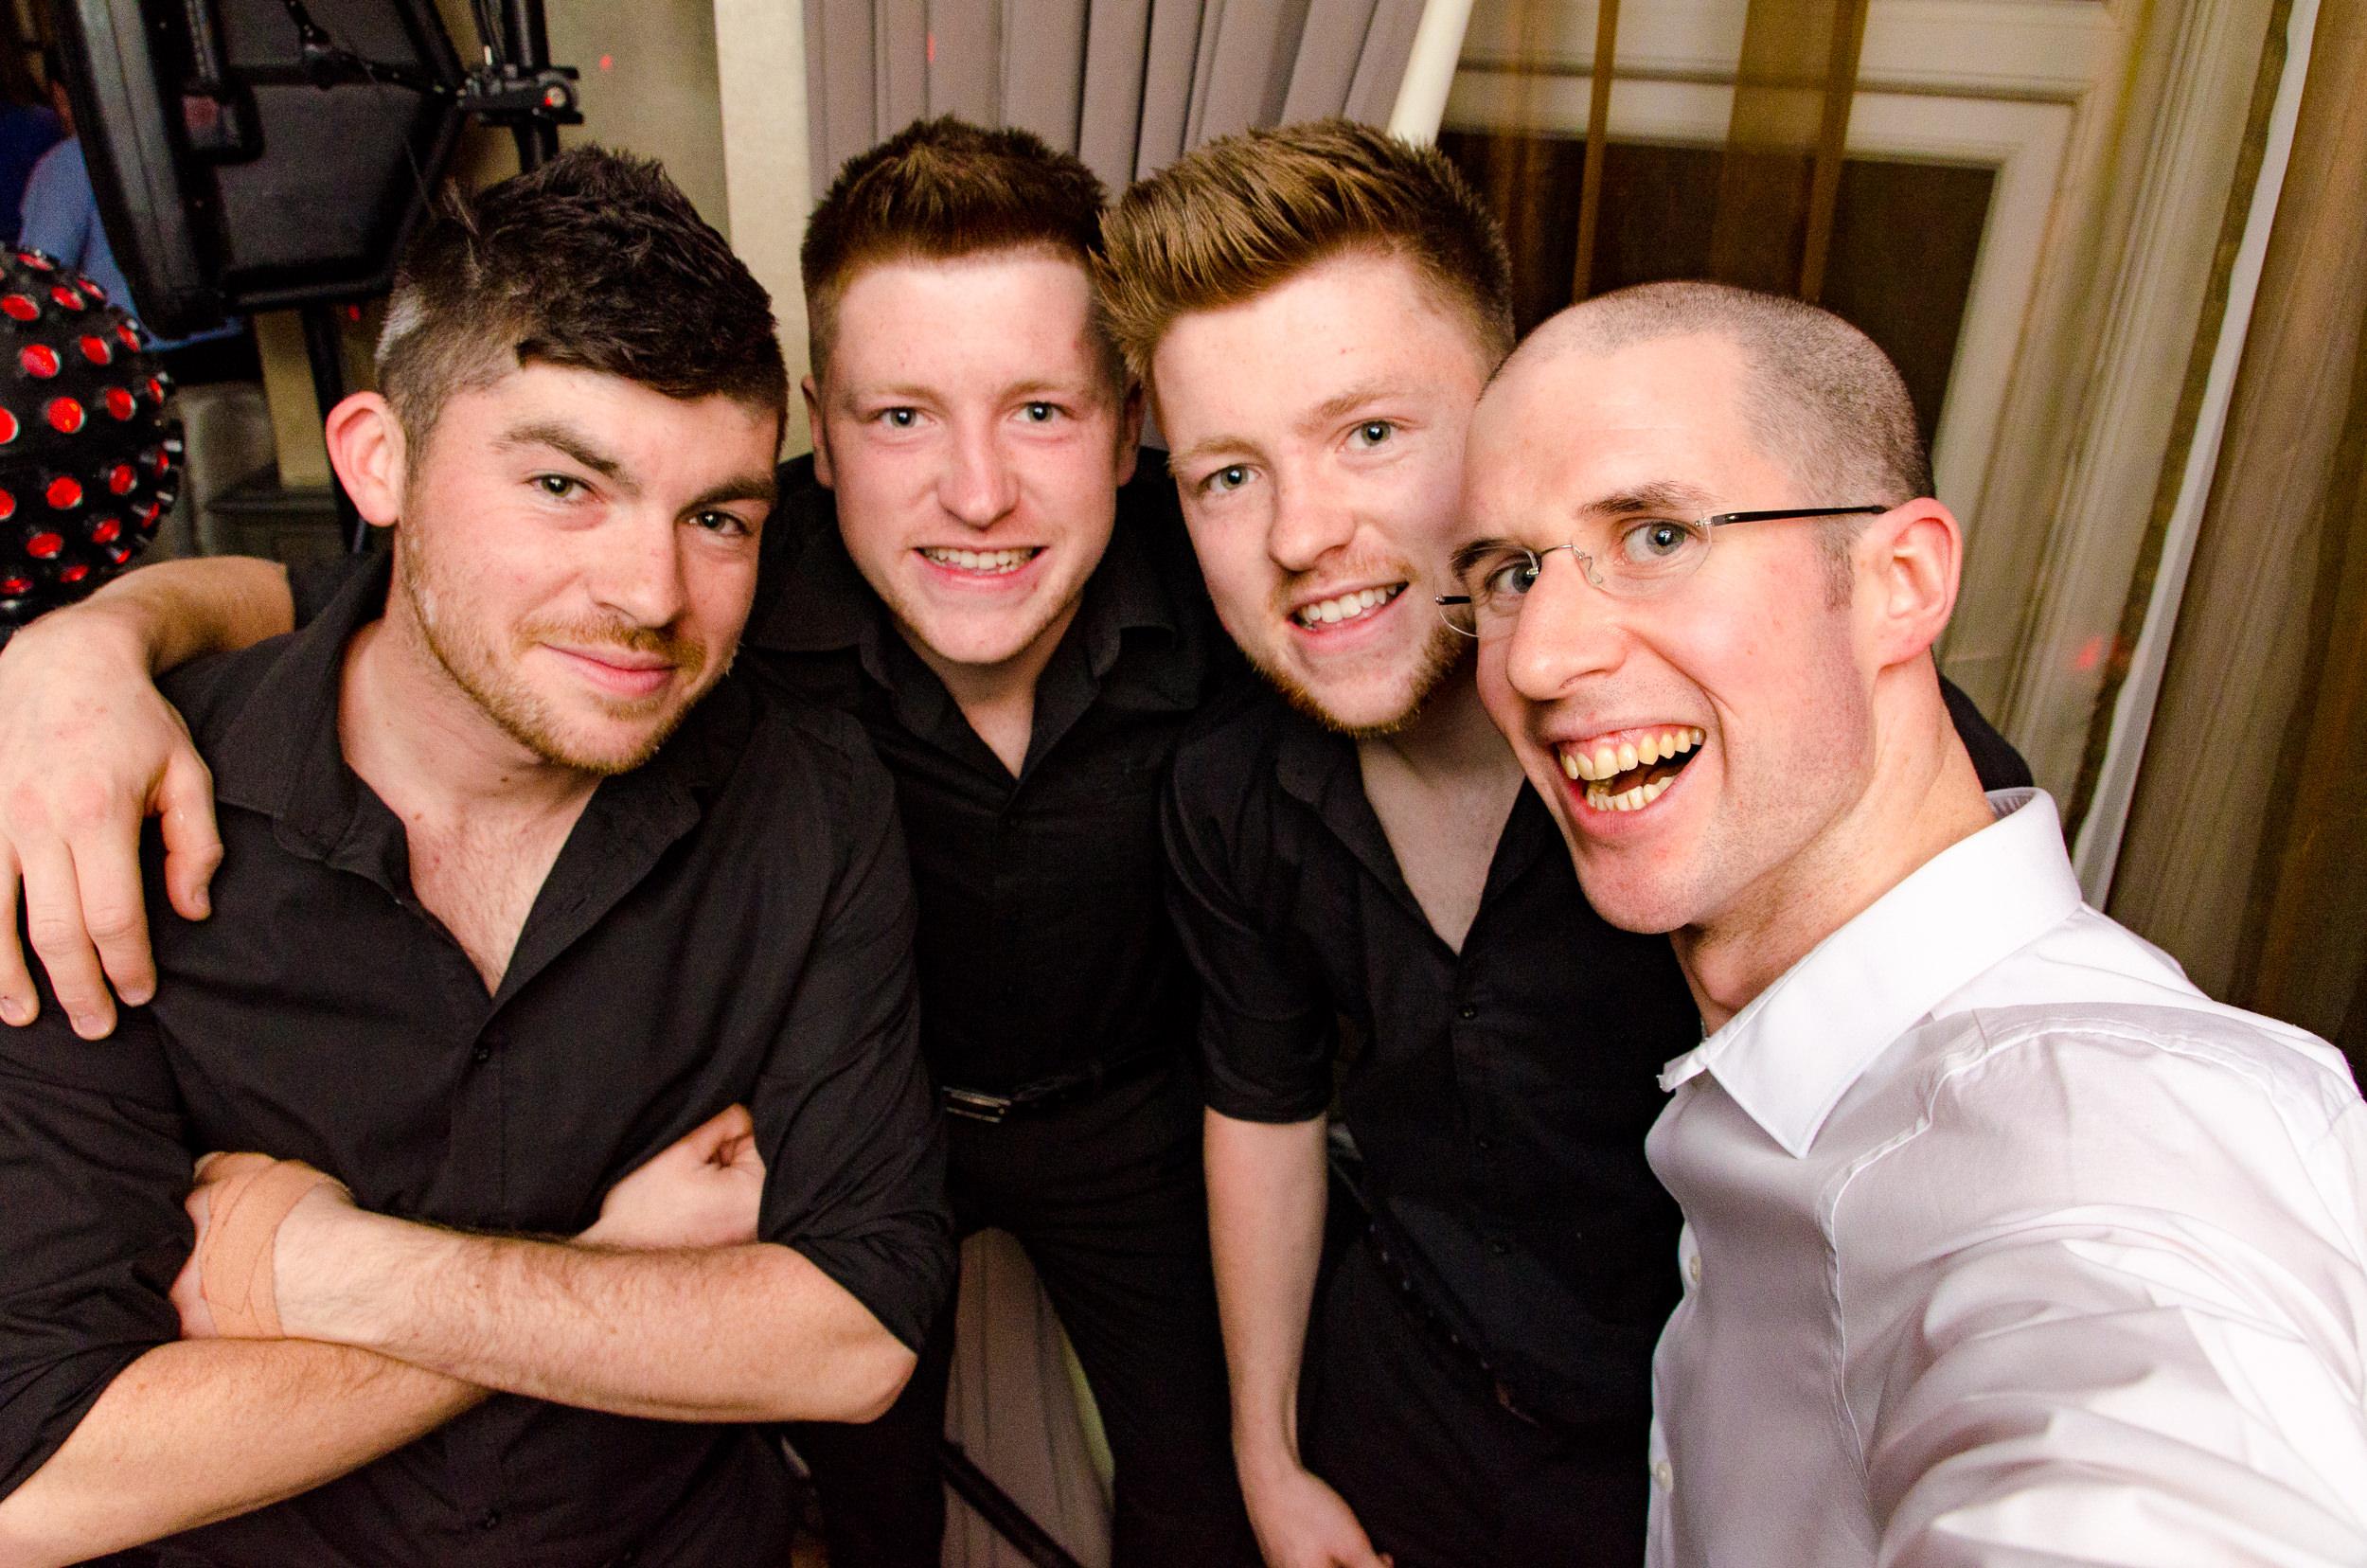 Sean, Brendan and Kieran Hester